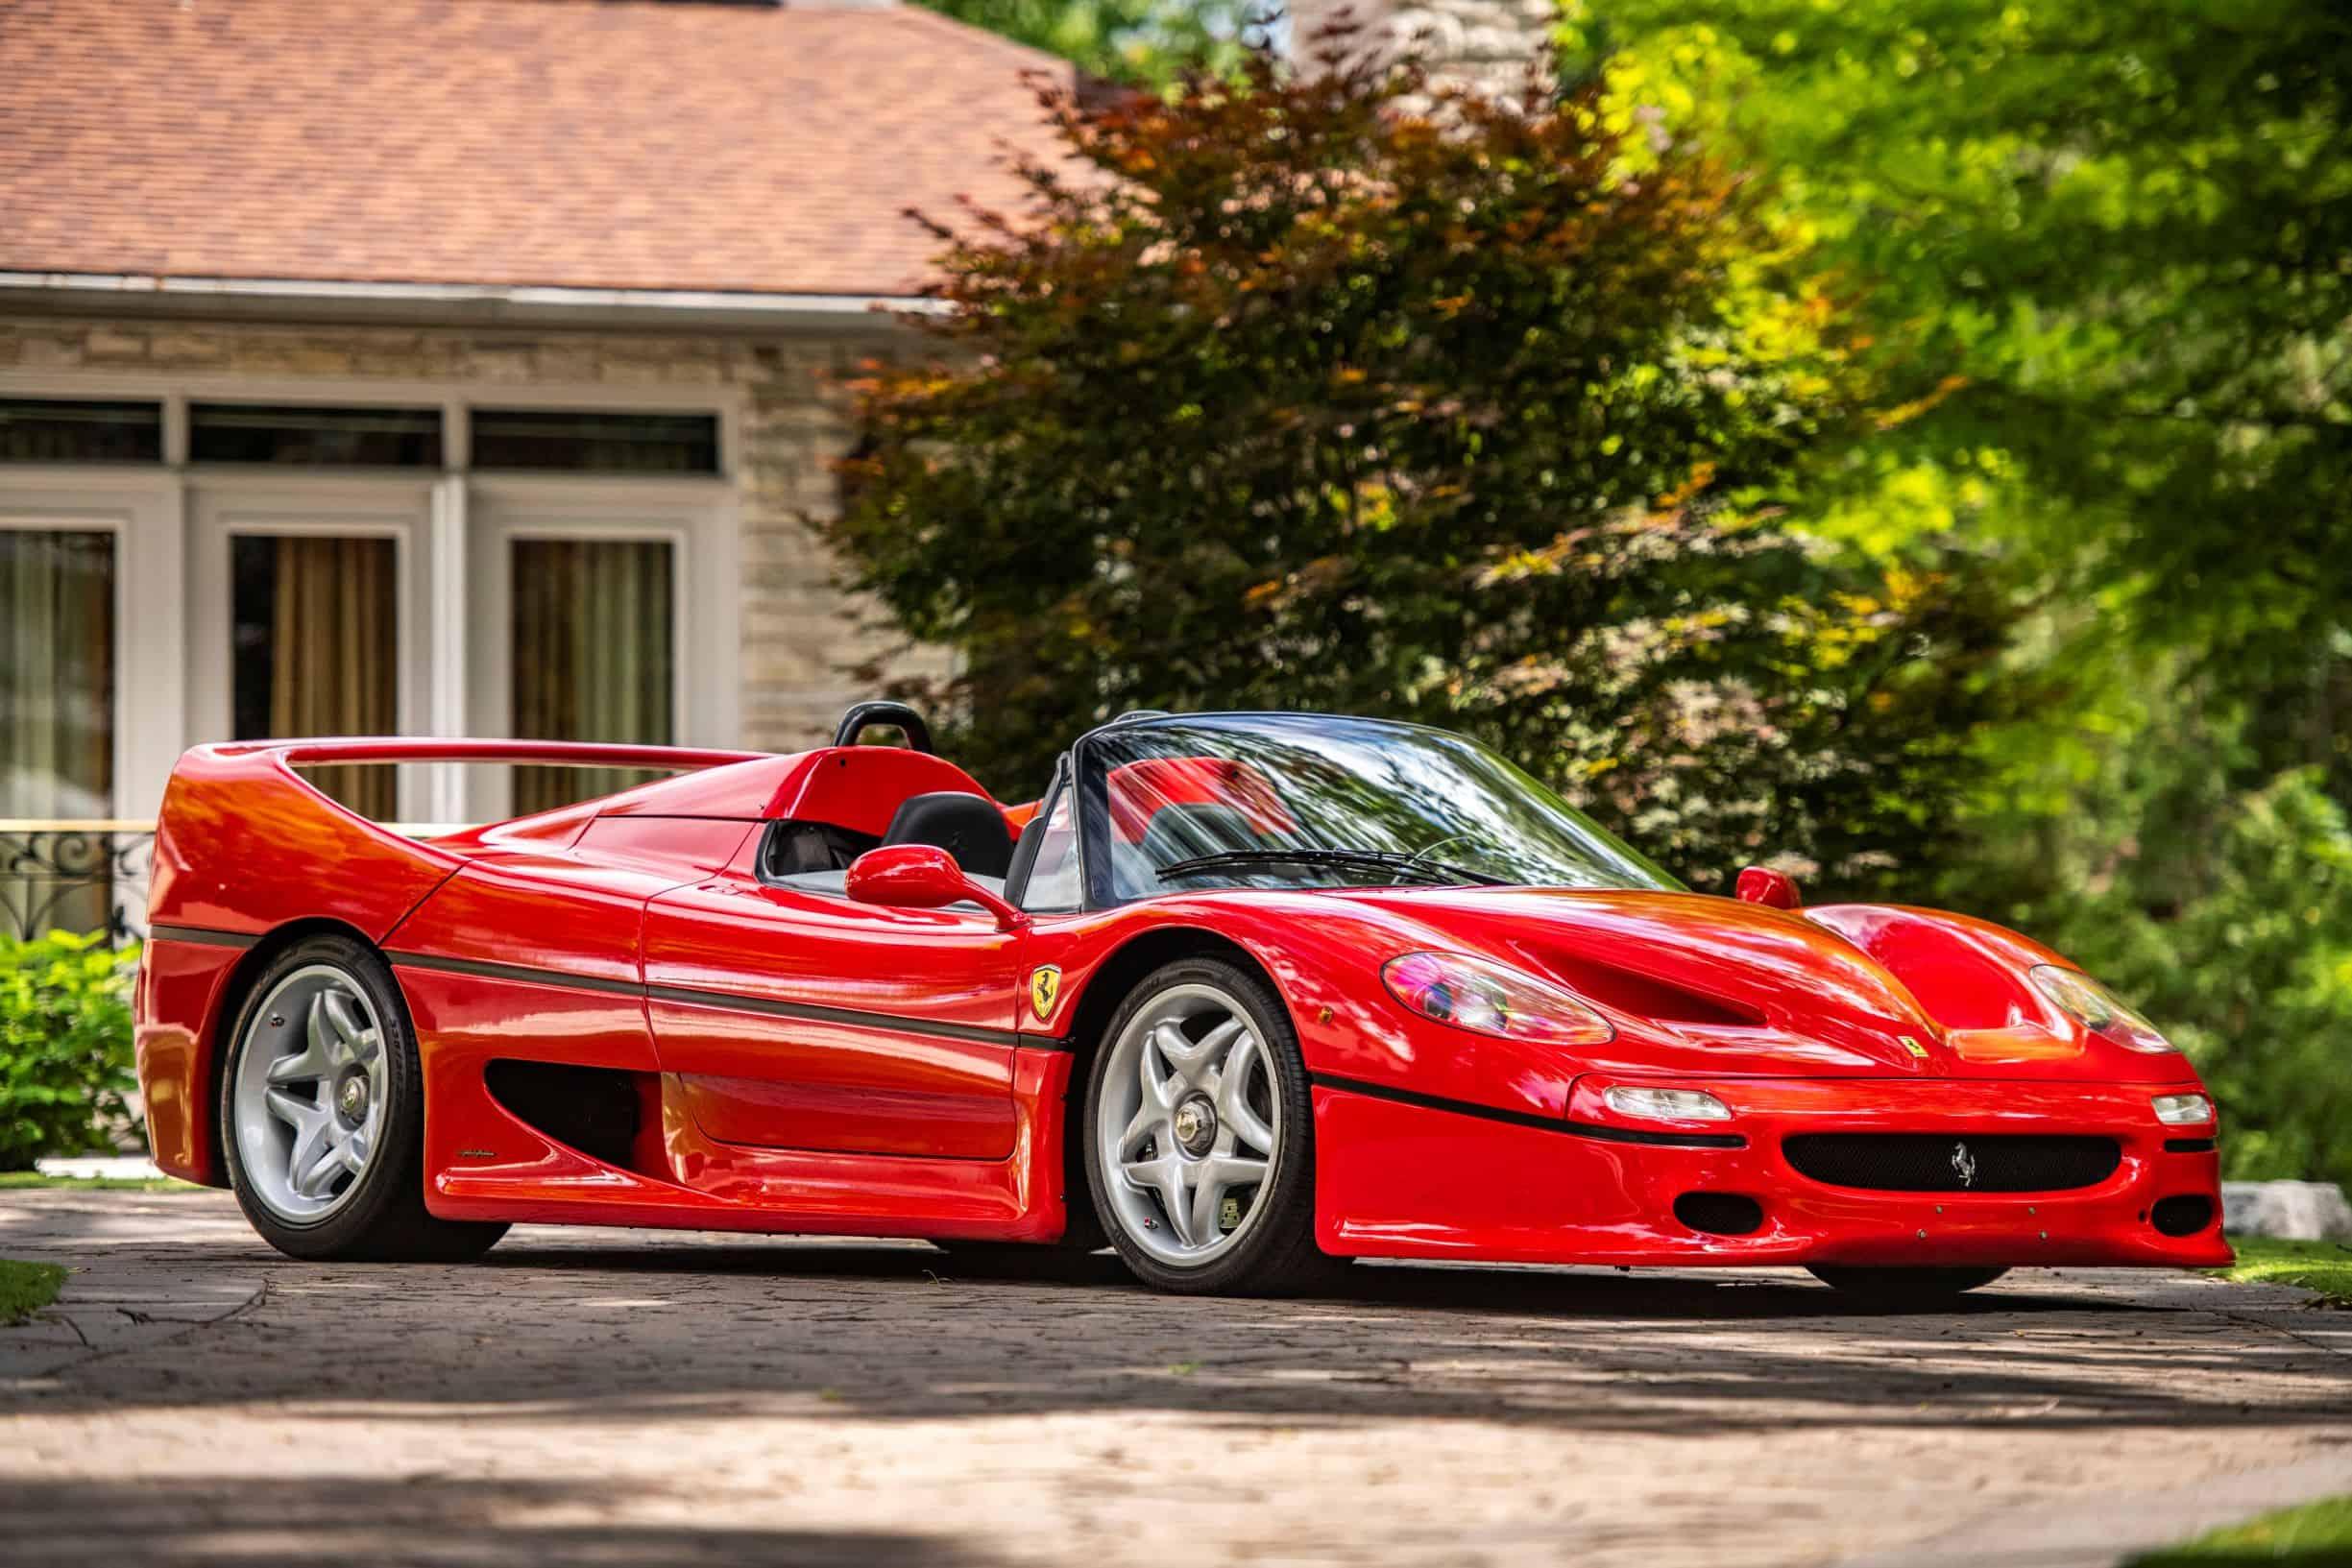 Ferrari F50 photographed by Scarfone